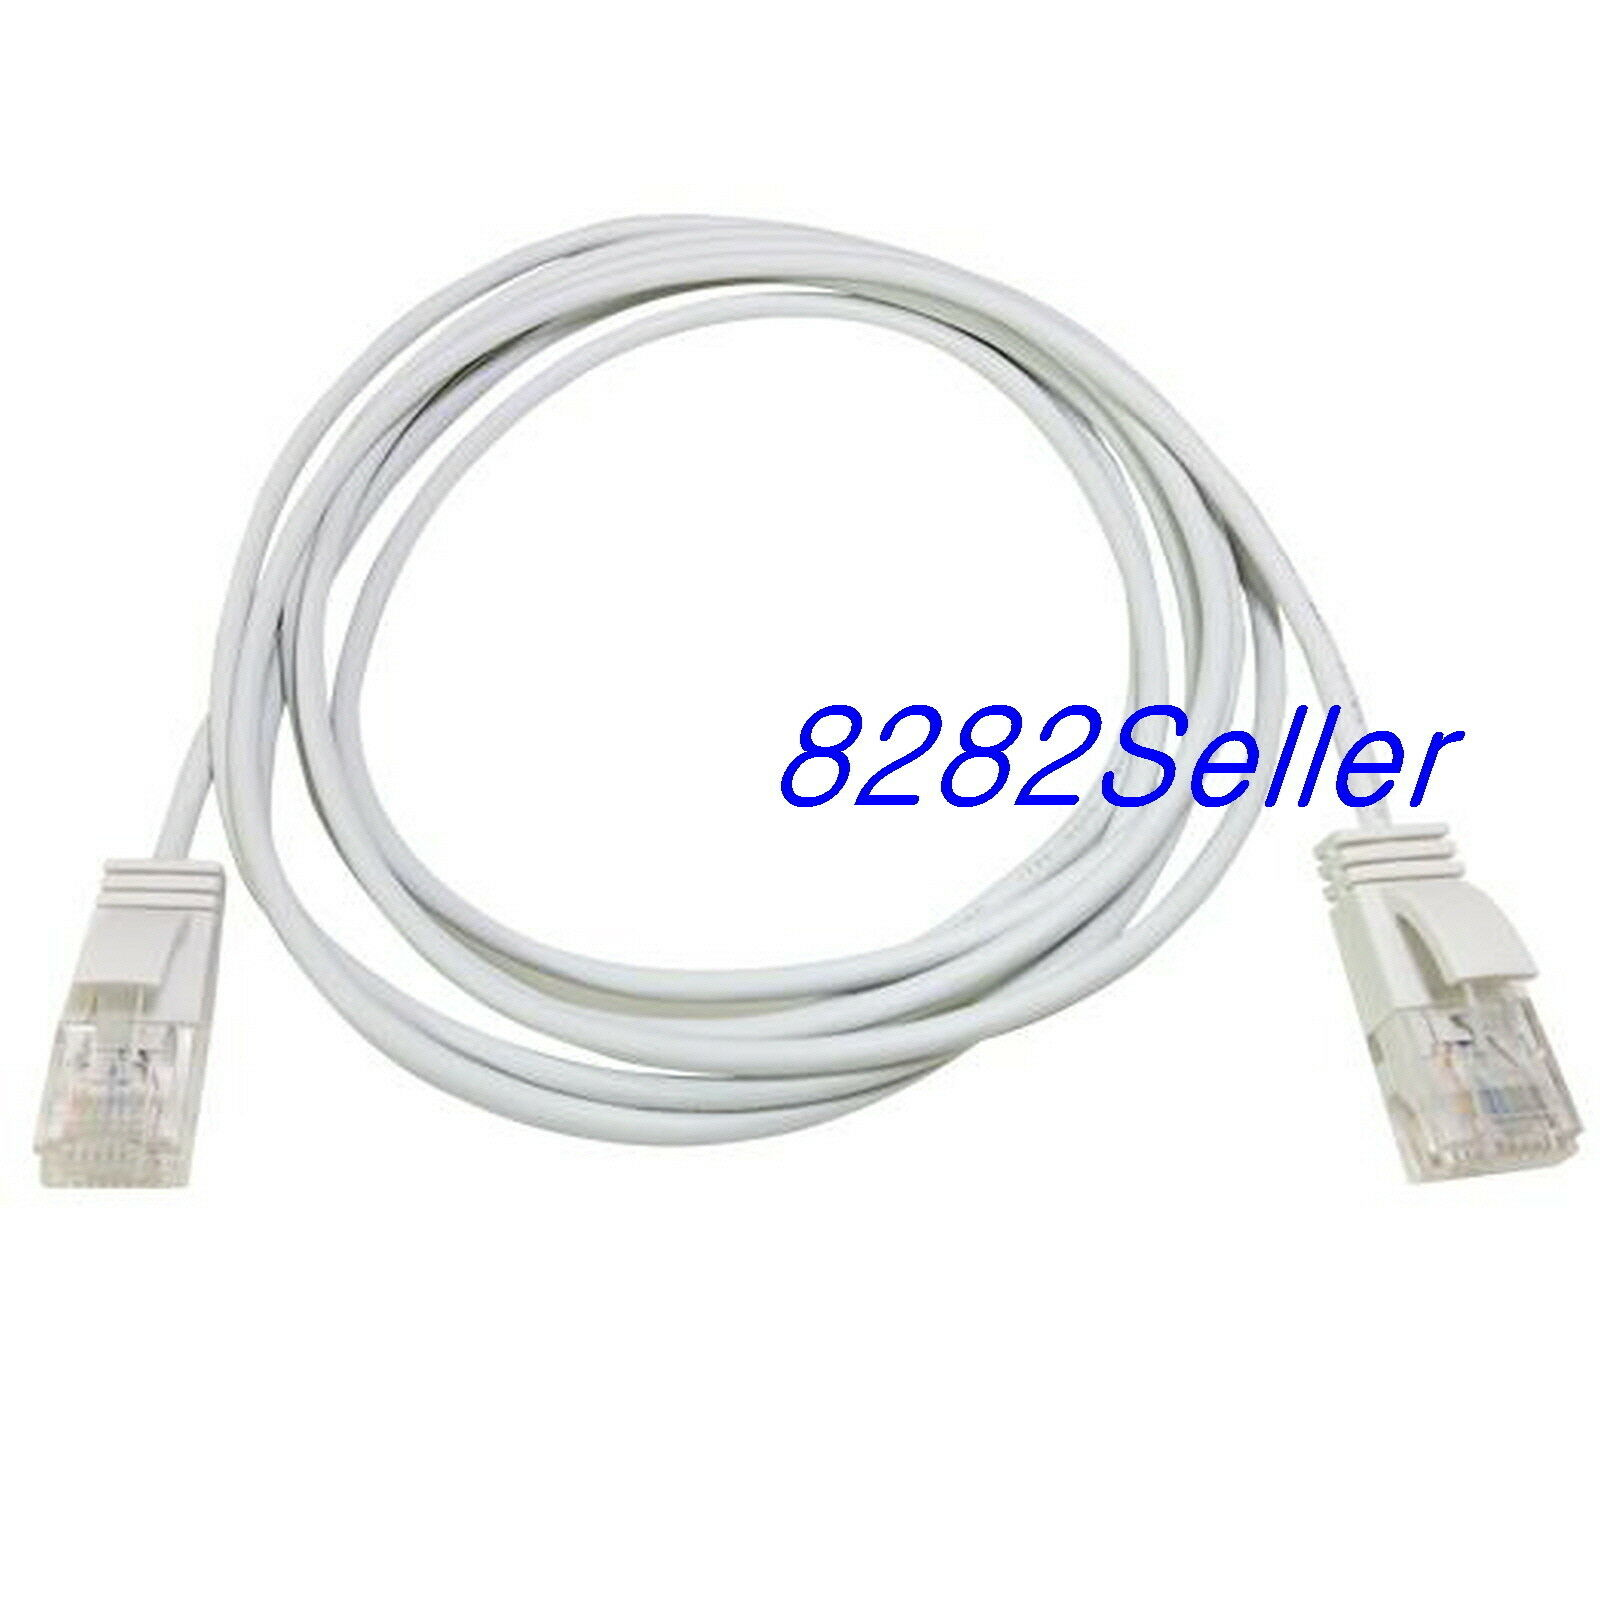 Belden Mohawk M58646 23//4P GigaLAN 10 UTP CAT6A Cable Plenum 10G Blue //100ft